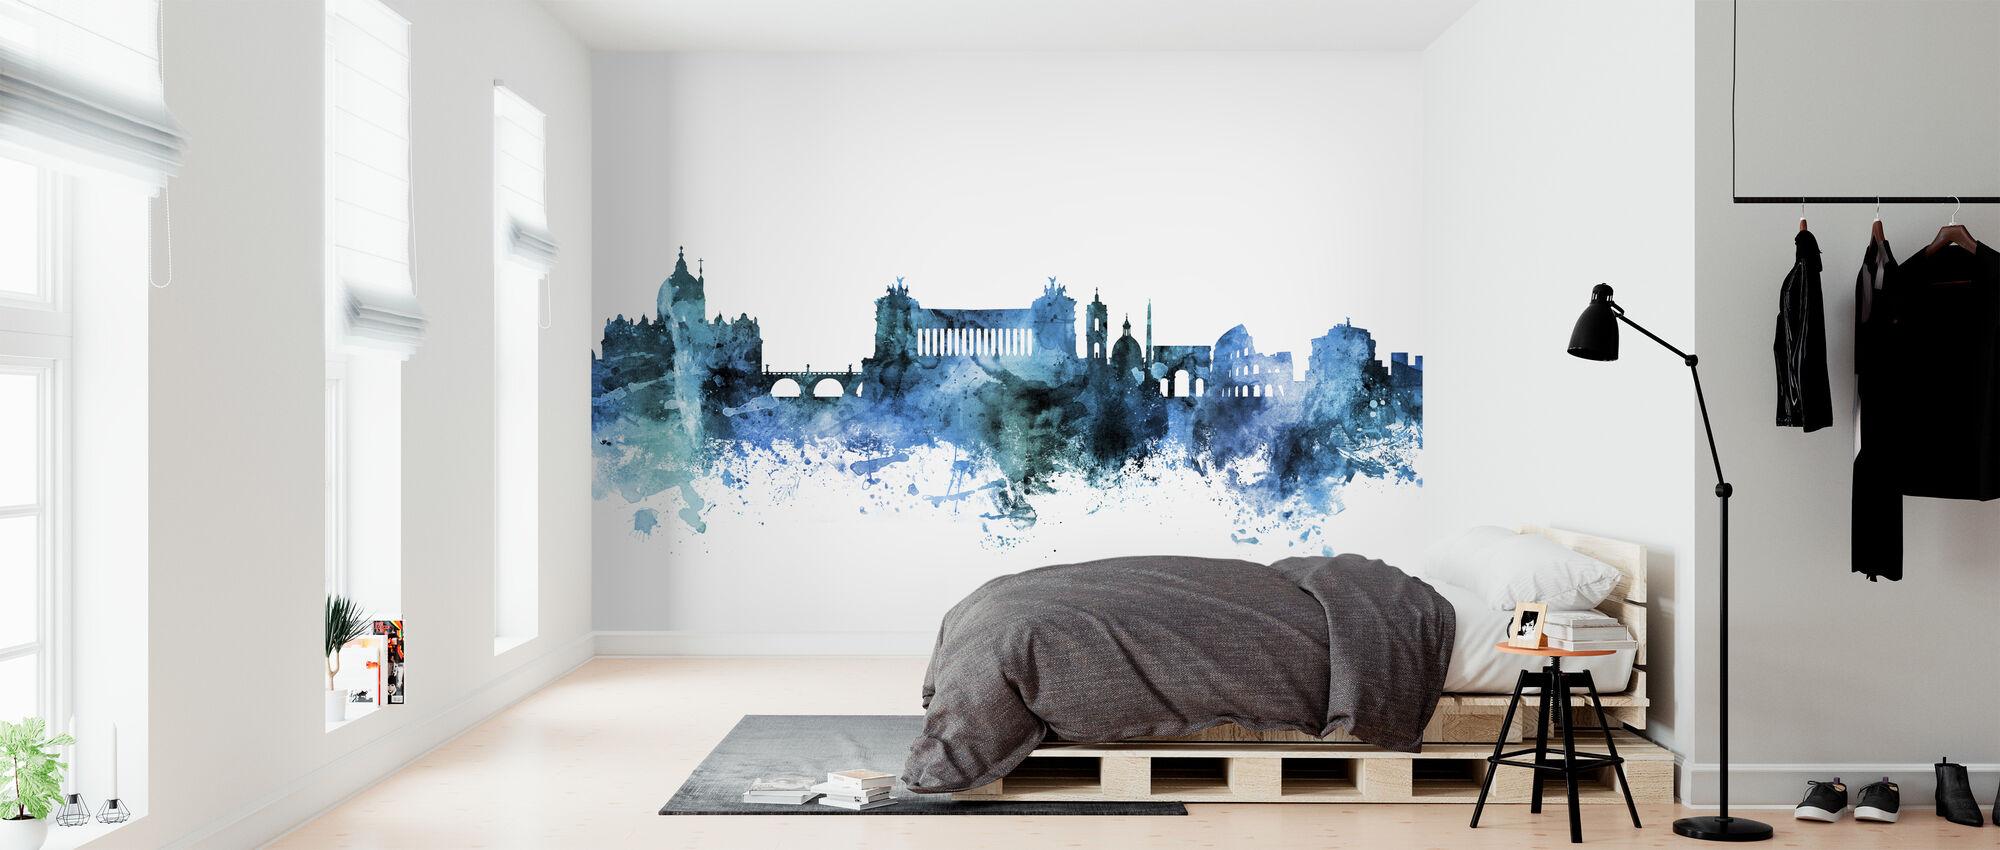 Rome Italy Skyline - Wallpaper - Bedroom